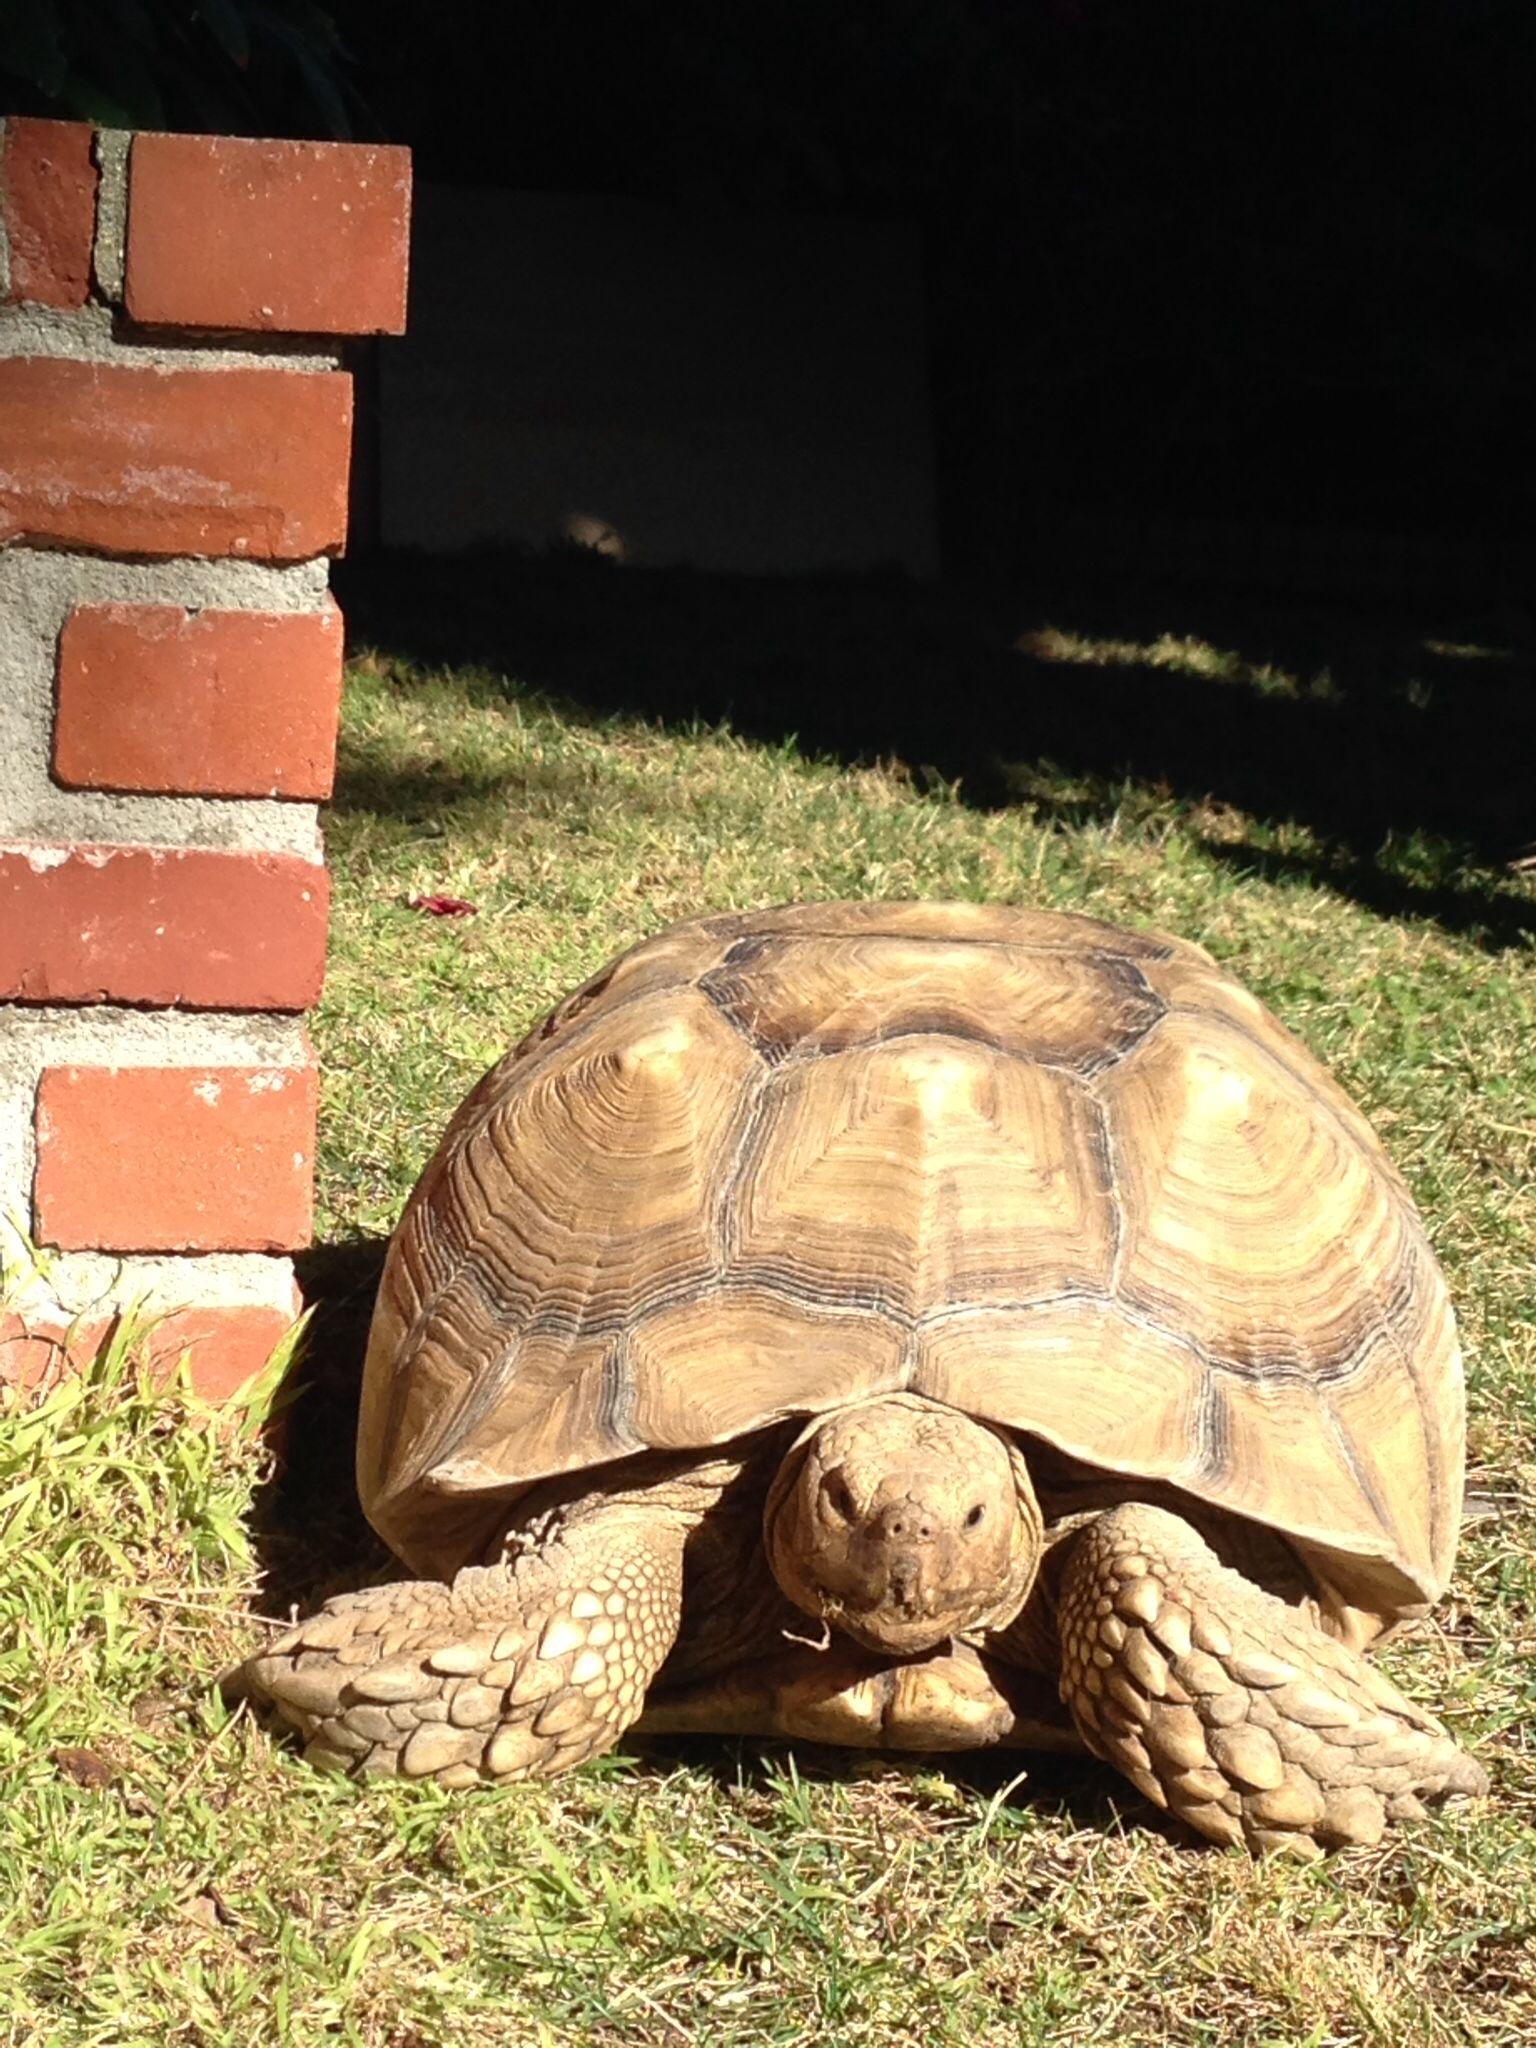 80 Pound Female Sulcata Tortoise 10 Years Old Sulcata Tortoise Tortoise Turtle Tortoises